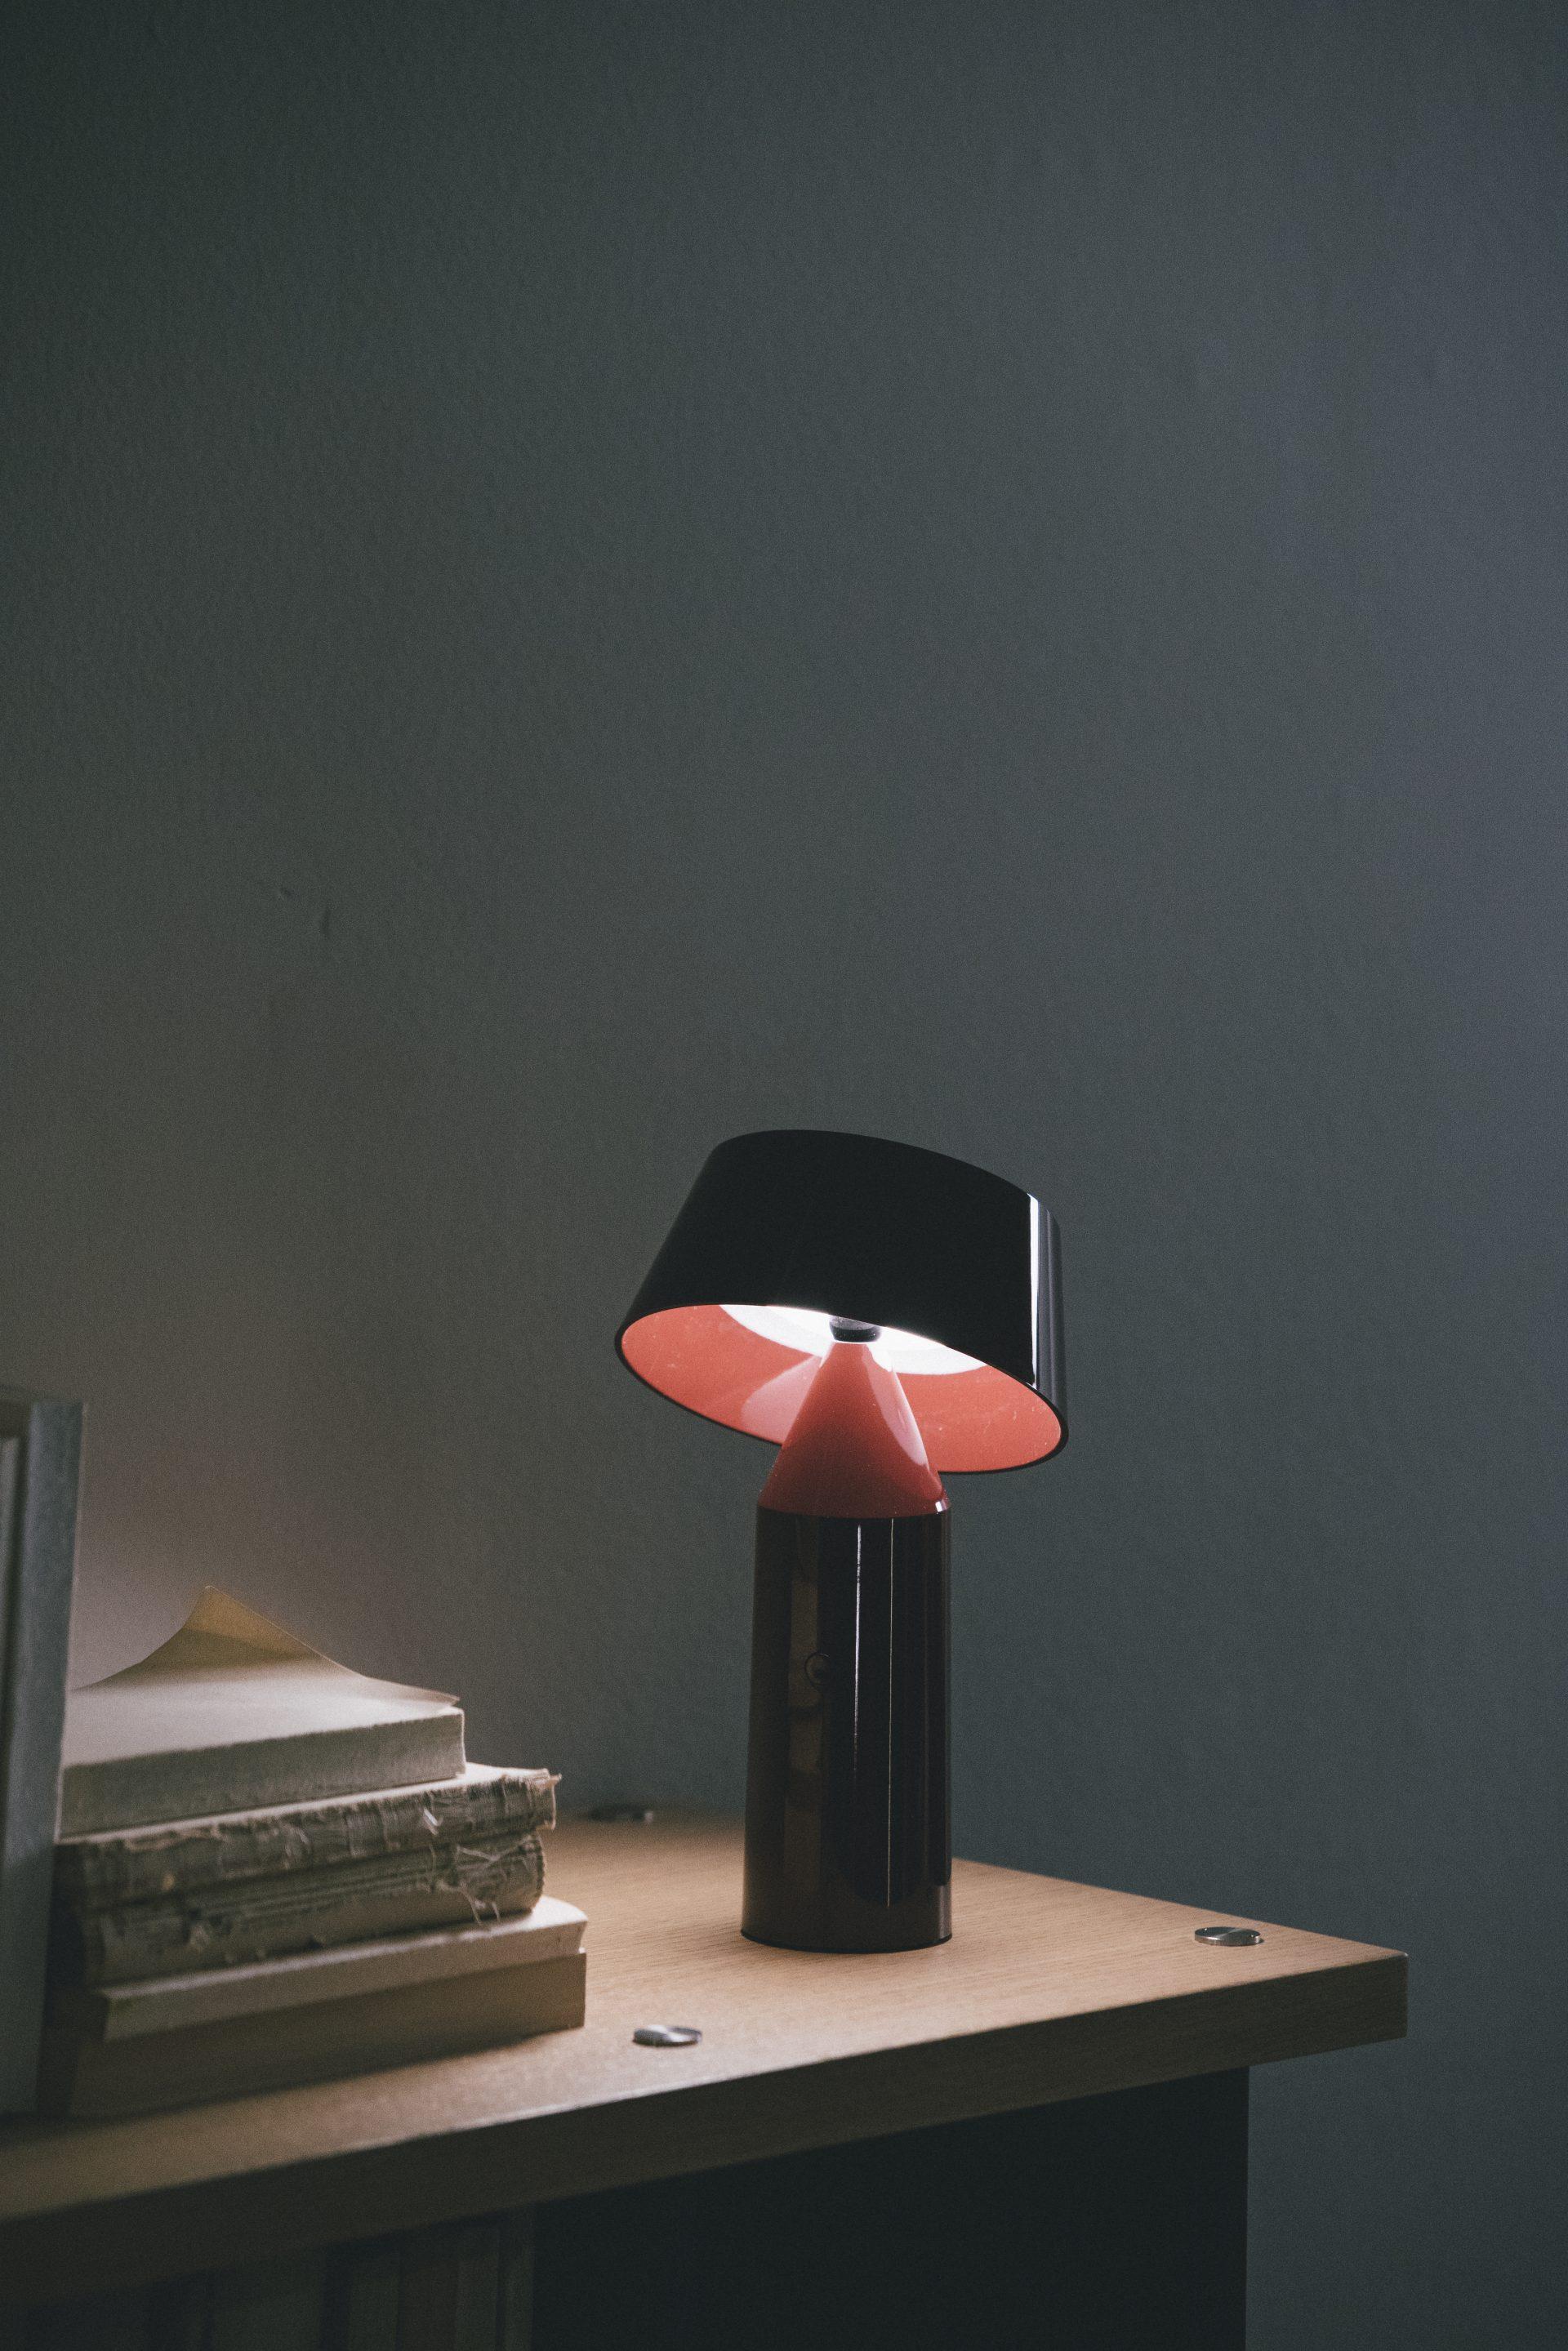 Lampe à poser design sans fil